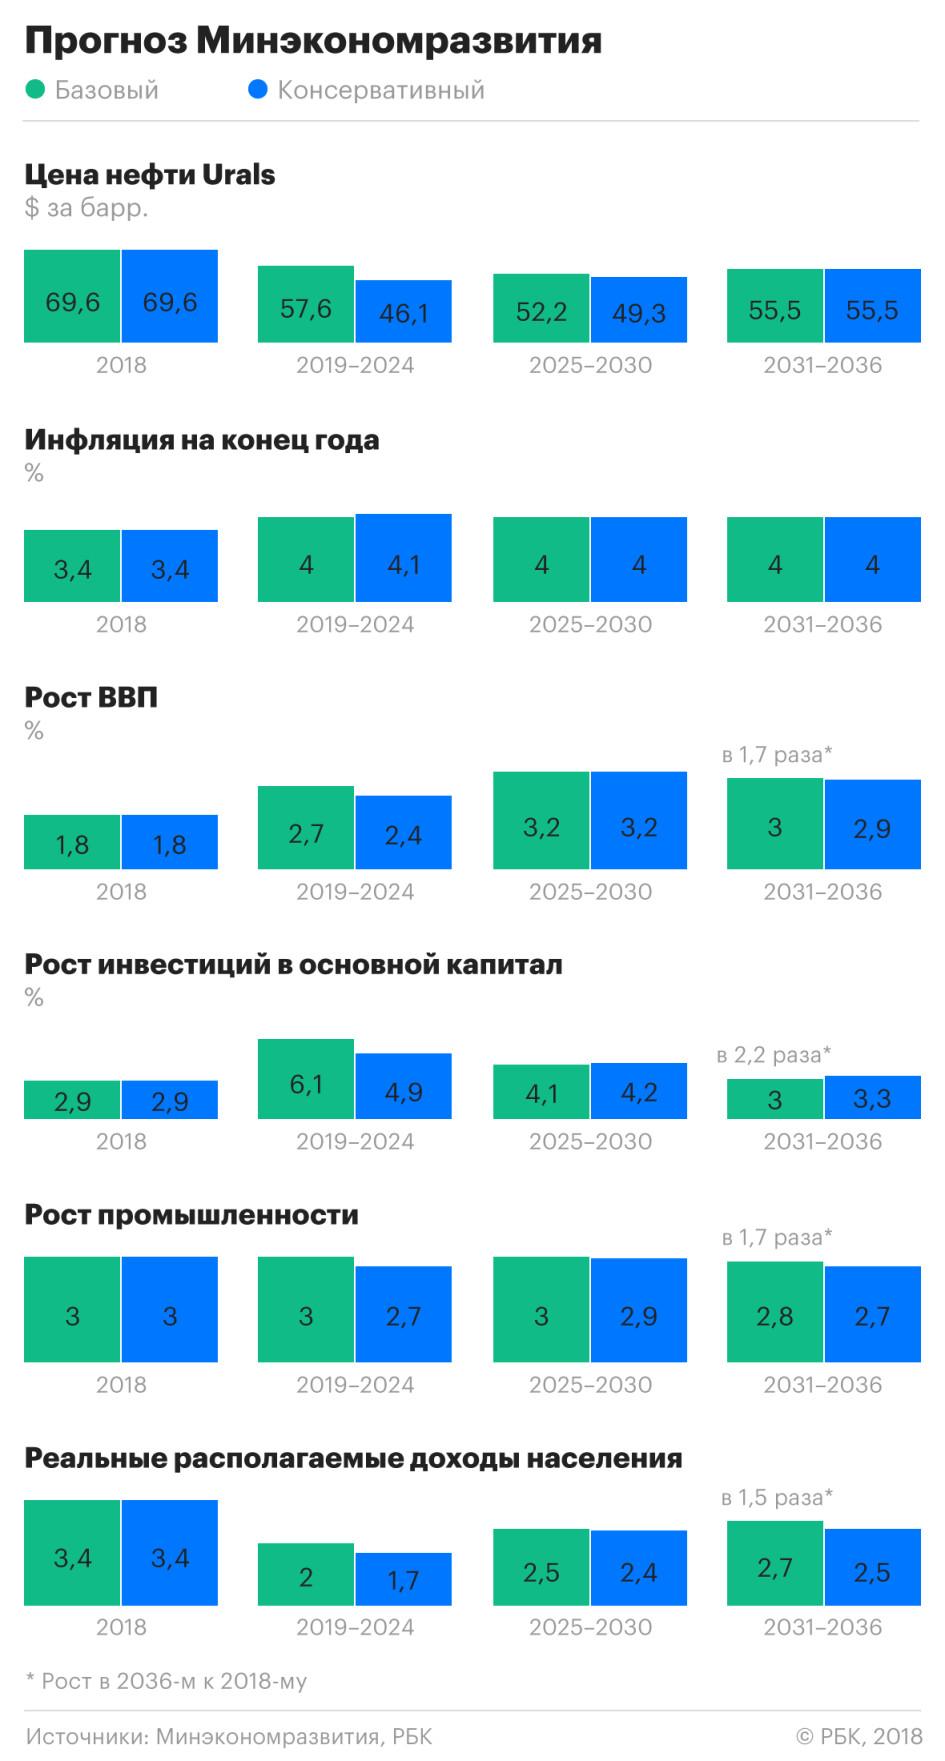 https://s0.rbk.ru/v6_top_pics/resized/945xH/media/img/0/75/755434279272750.jpeg